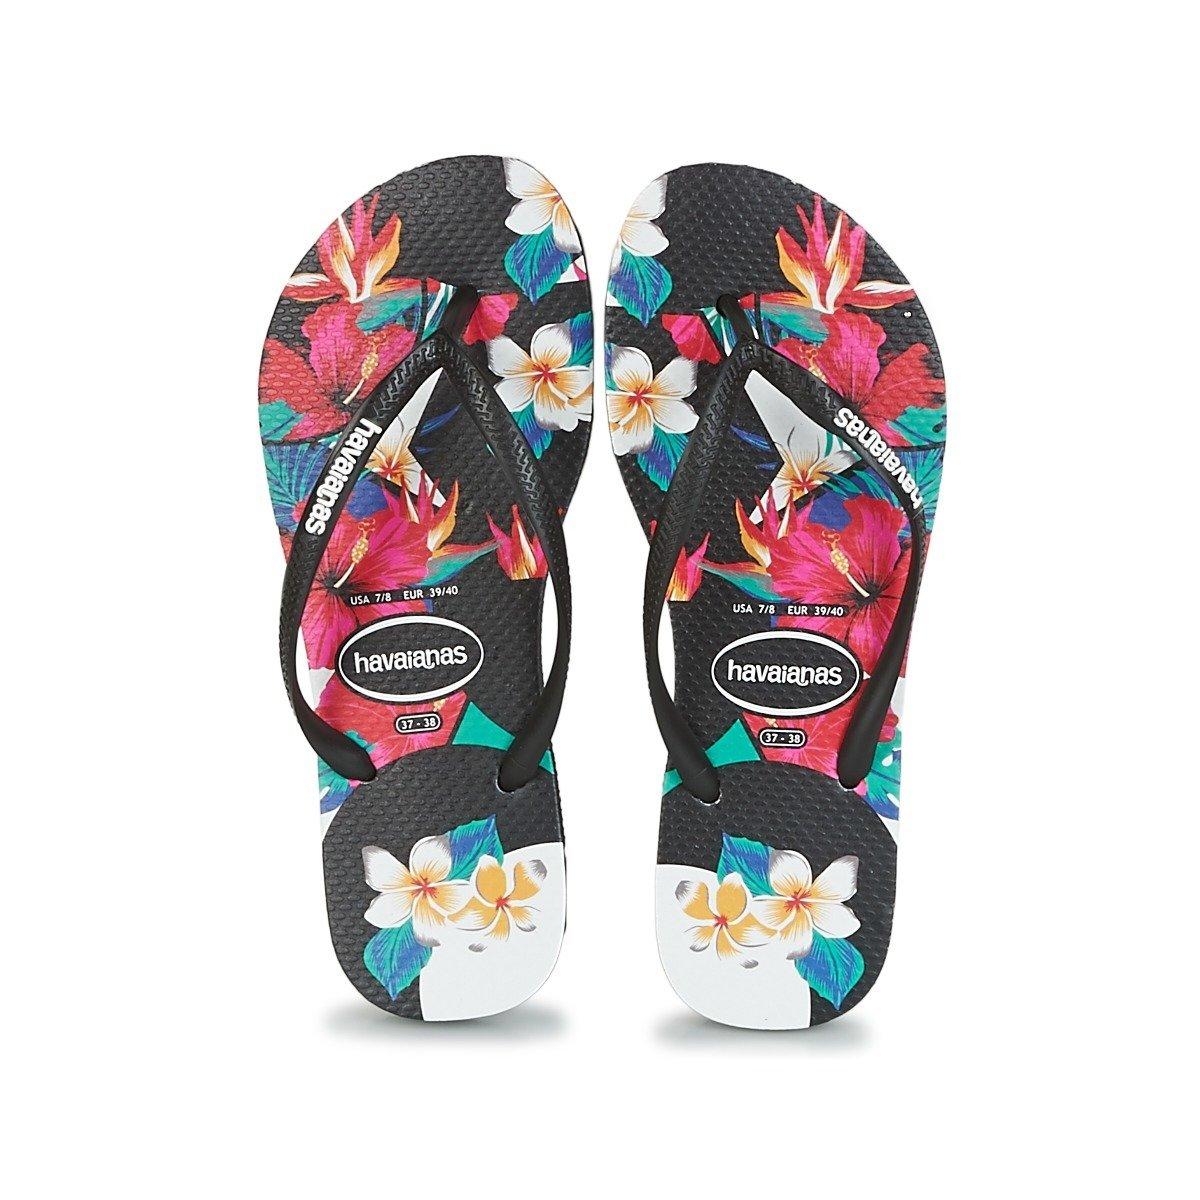 Tongs femme HAVAIANAS slim floral noir havaianas-S18 slim floral black